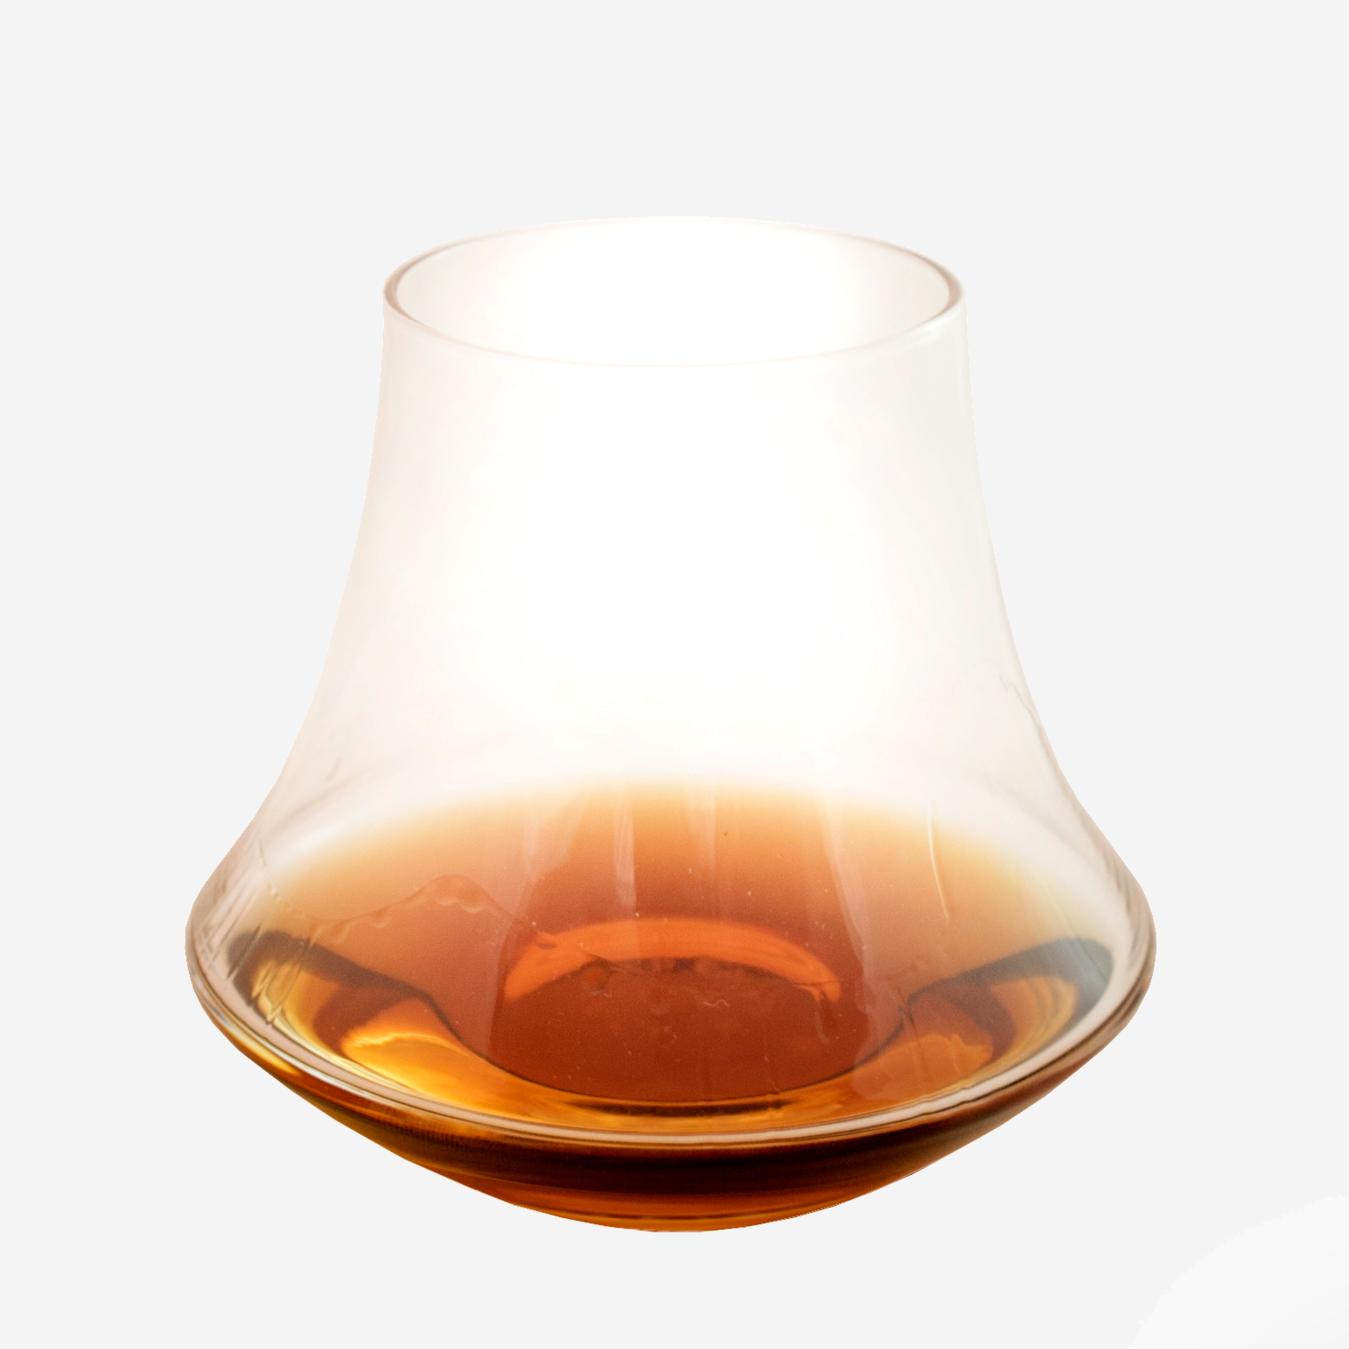 Denver & Liely - Whiskey Glass